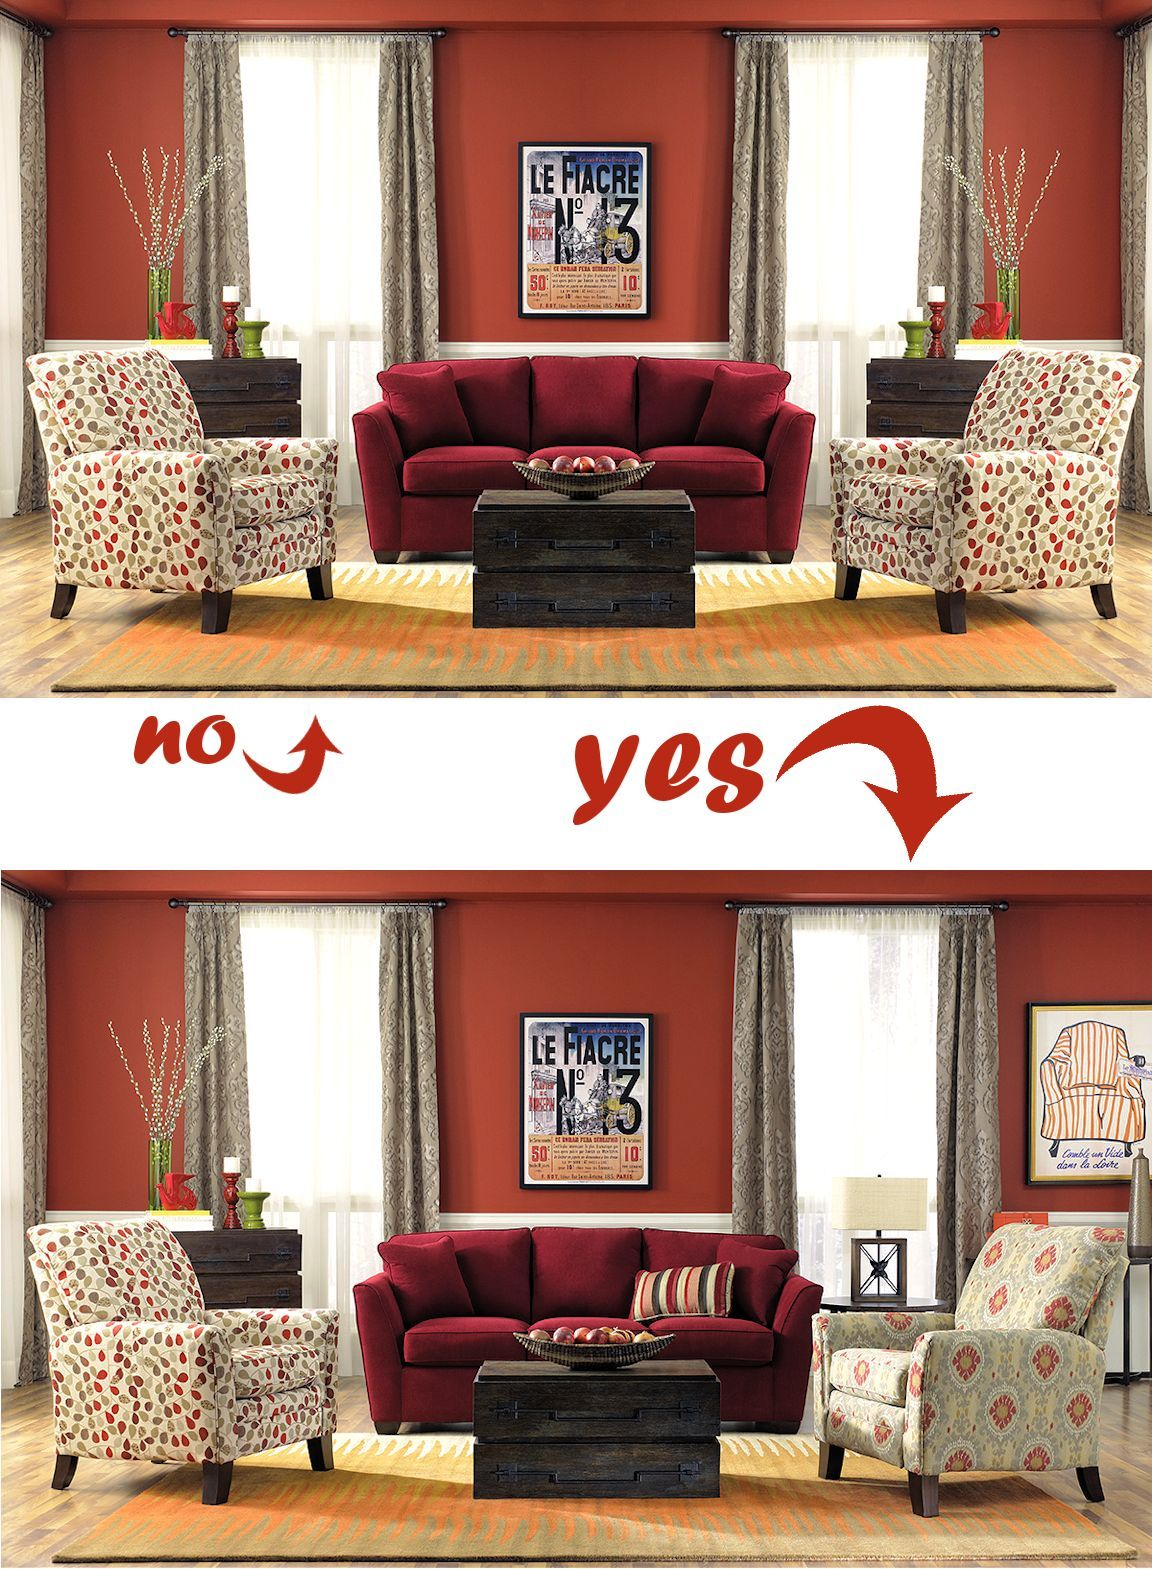 Balancing Act Creating Asymmetry Design Meets Comfort La Z Boy Furniture Galleries Arizona Momcave